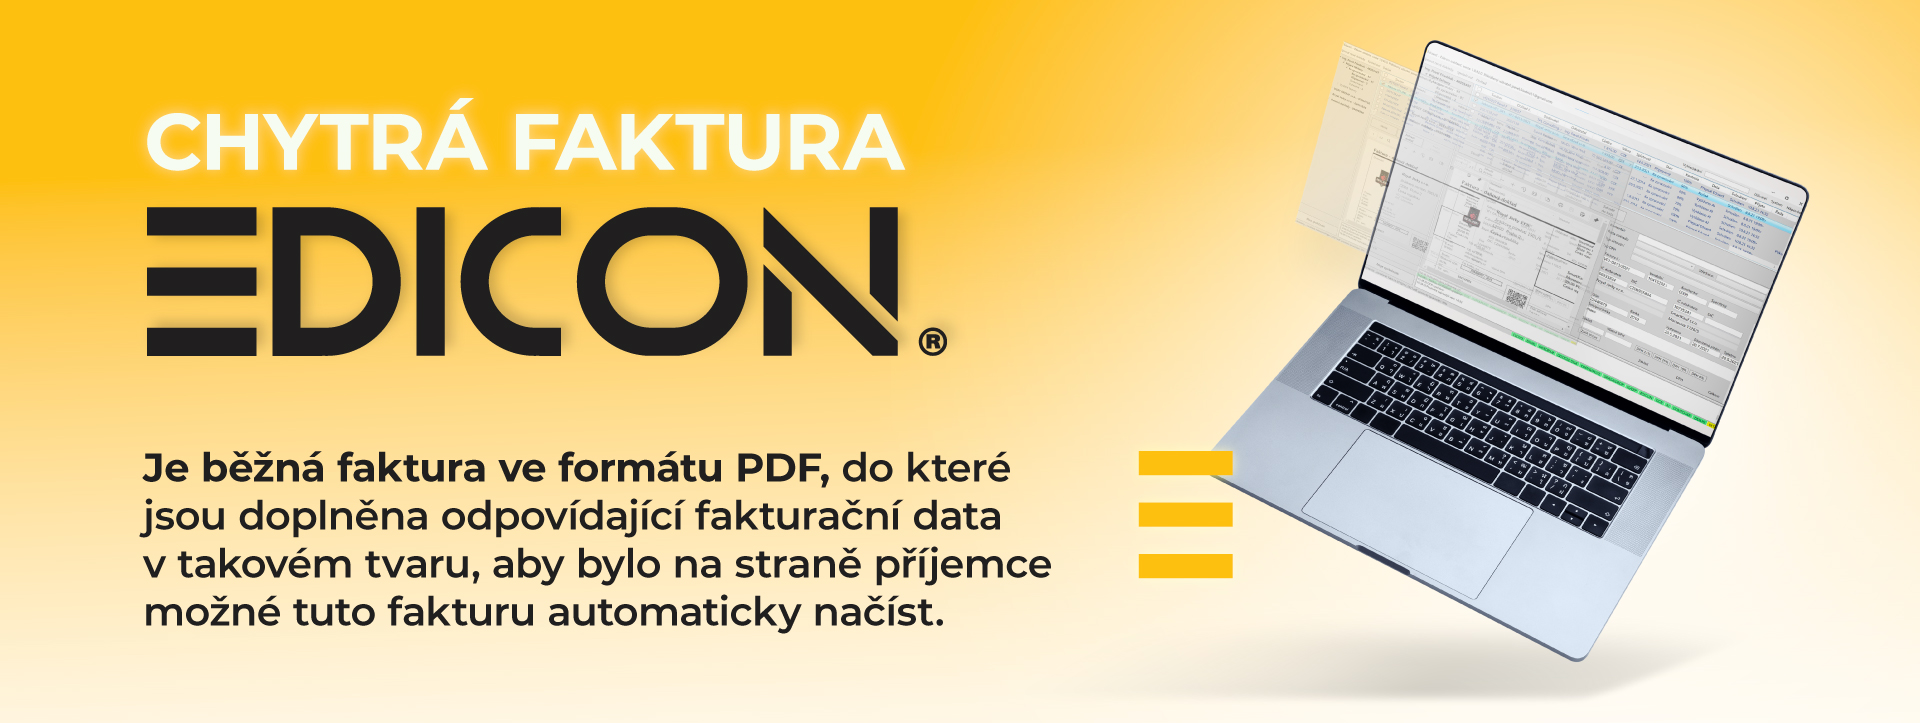 https://www.edicon.cz/wp-content/uploads/2021/09/Edicon_banner_chytrá-faktura.jpg